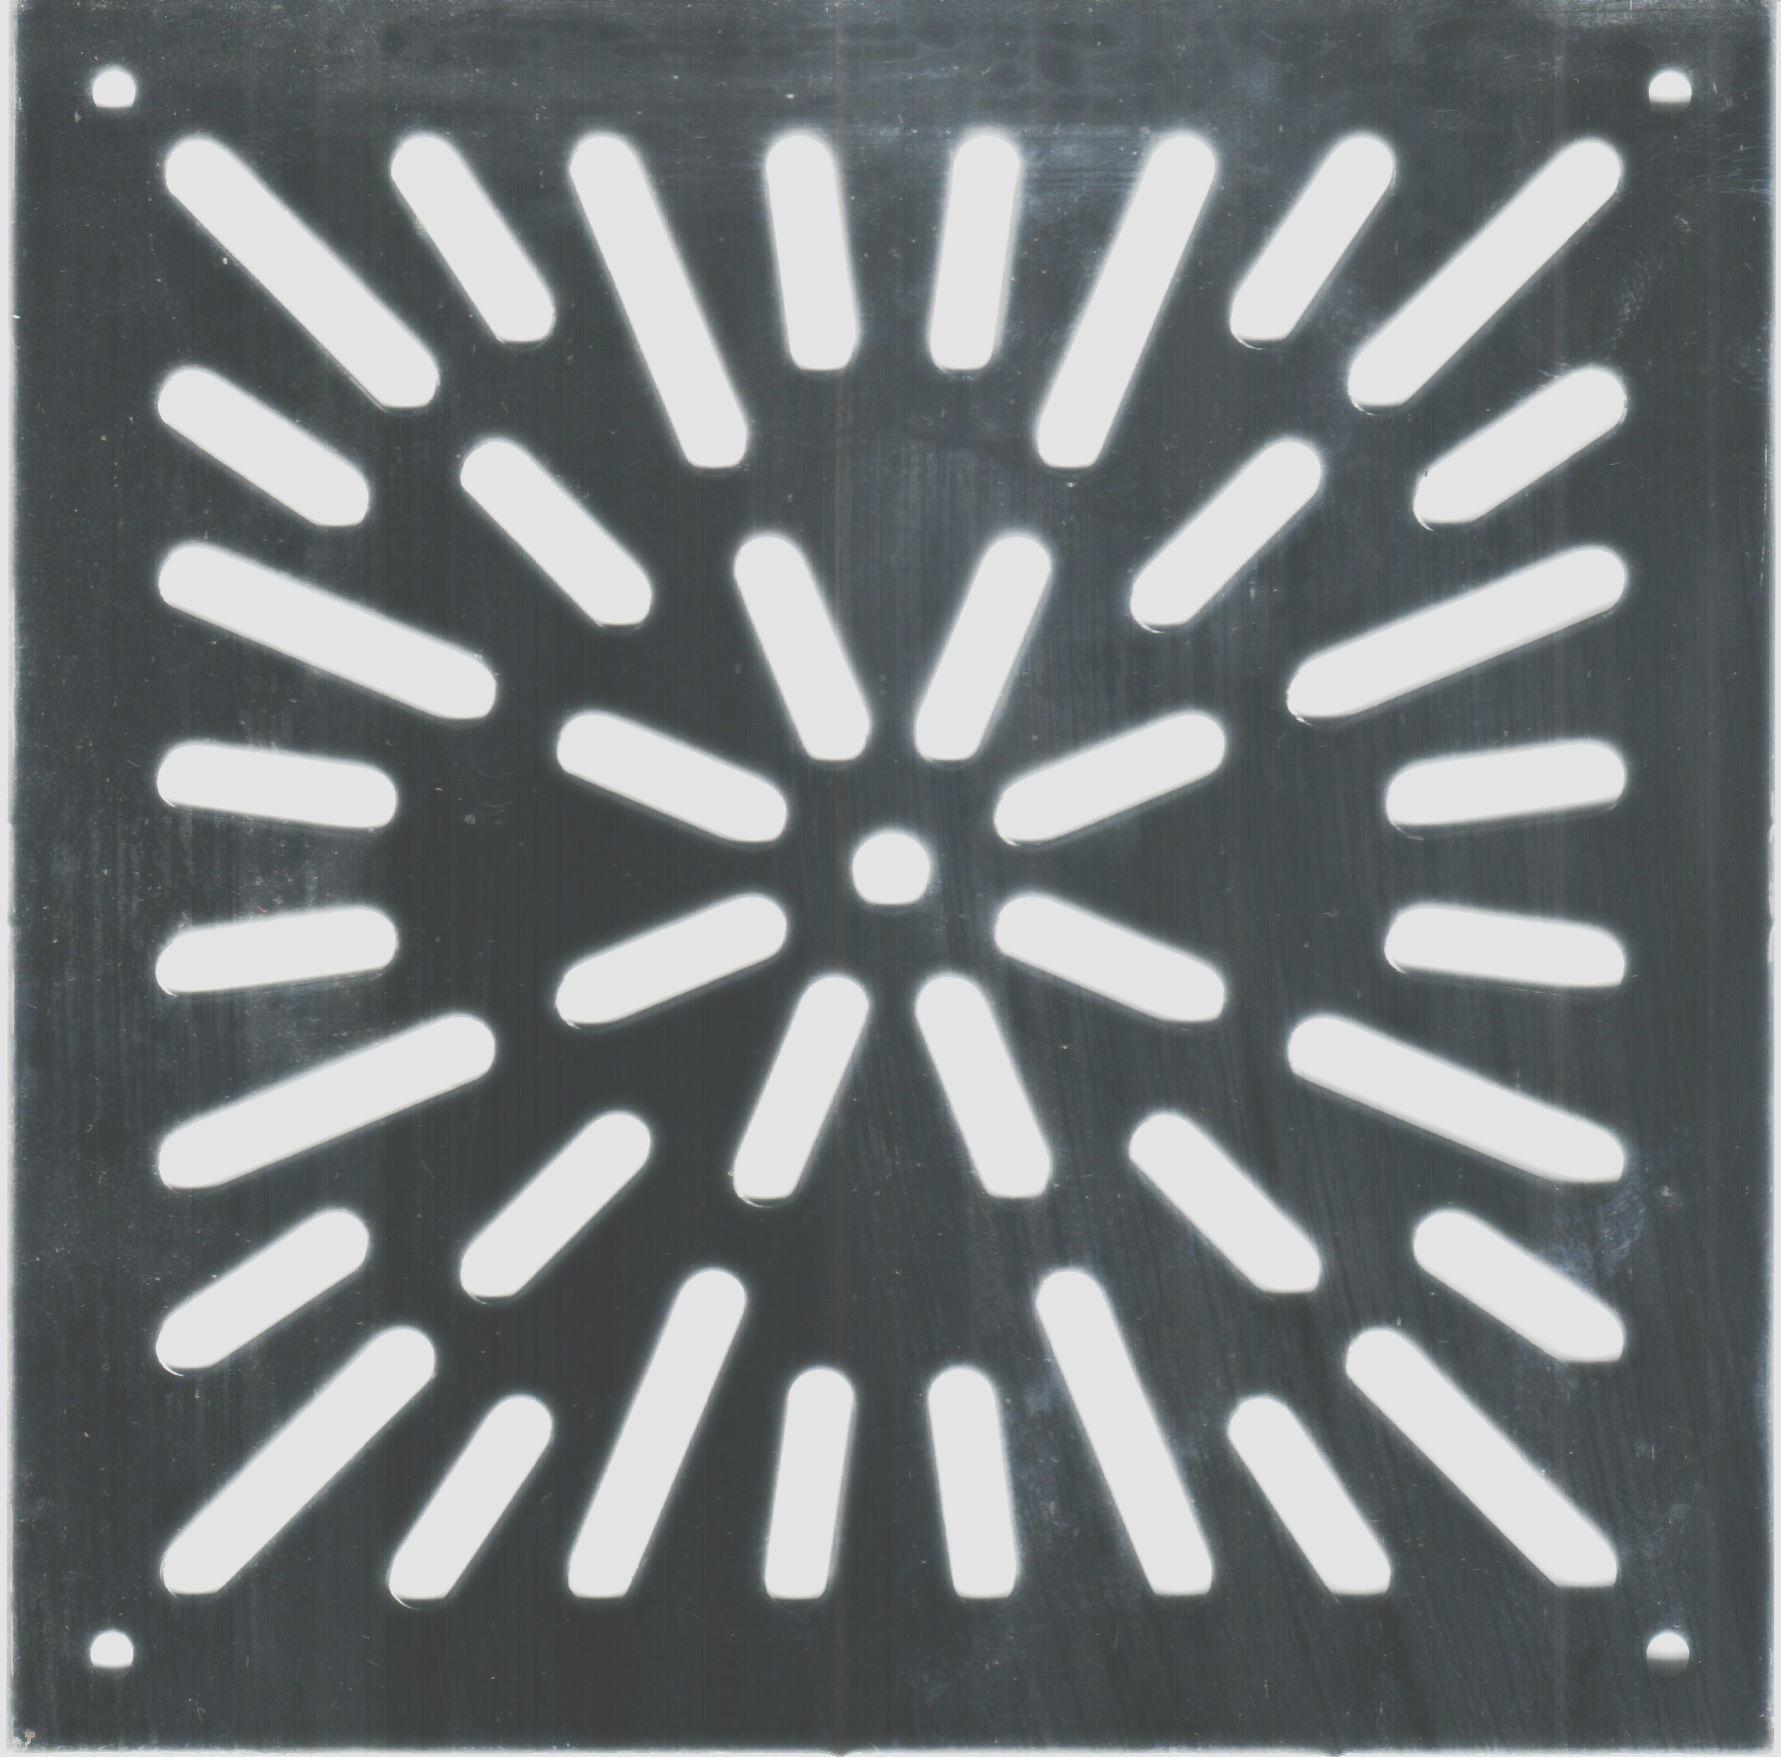 Каталог Решётка напольная 150х150 (вариант 2) из нержавеющей стали нерж2.jpg